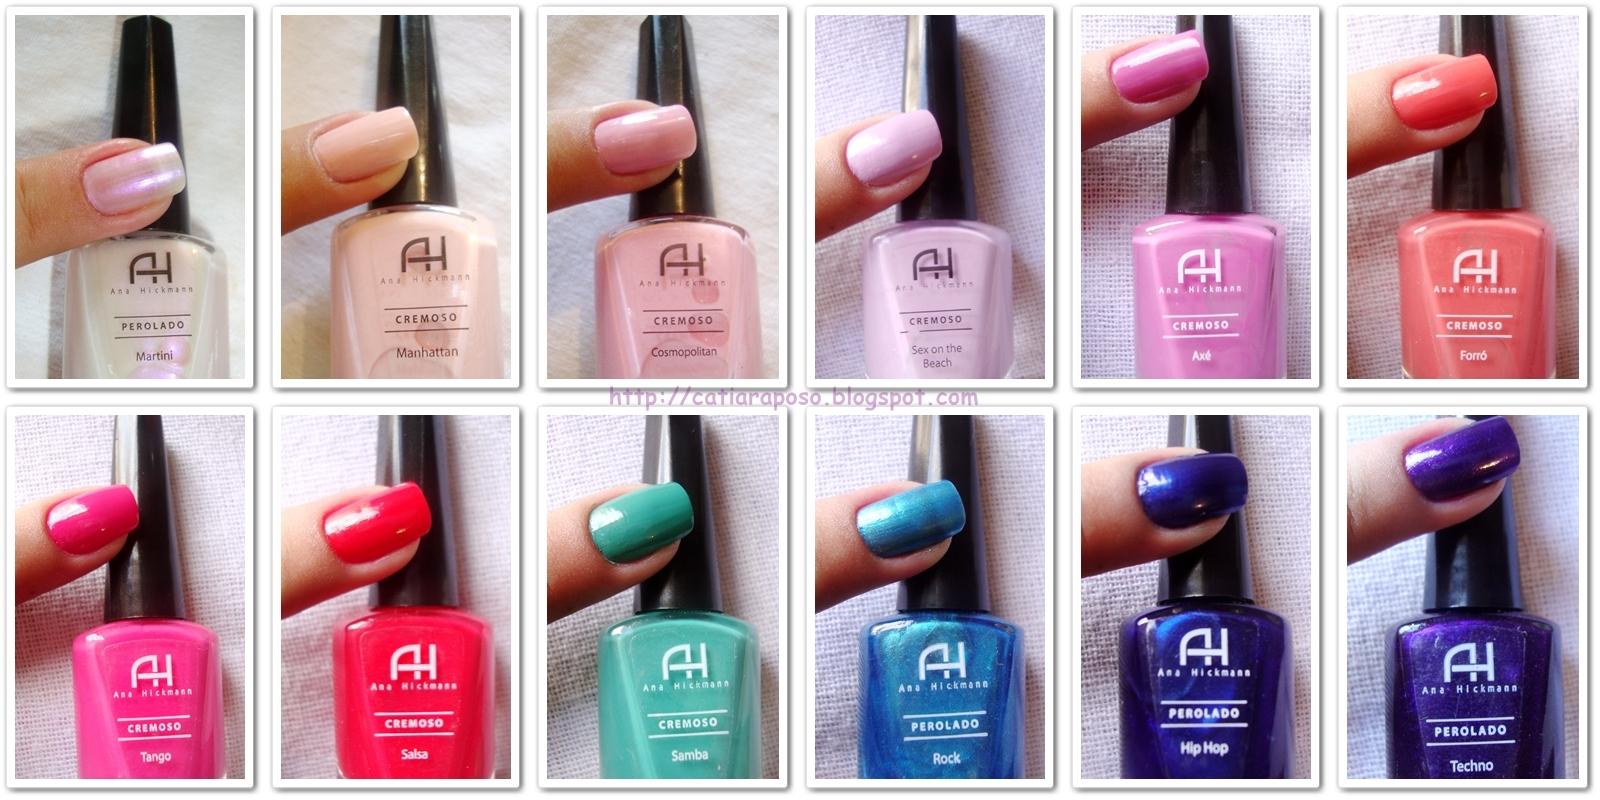 Esmaltes ana hickmann favorita manicure e pedicure esmaltes ana hickmann altavistaventures Choice Image